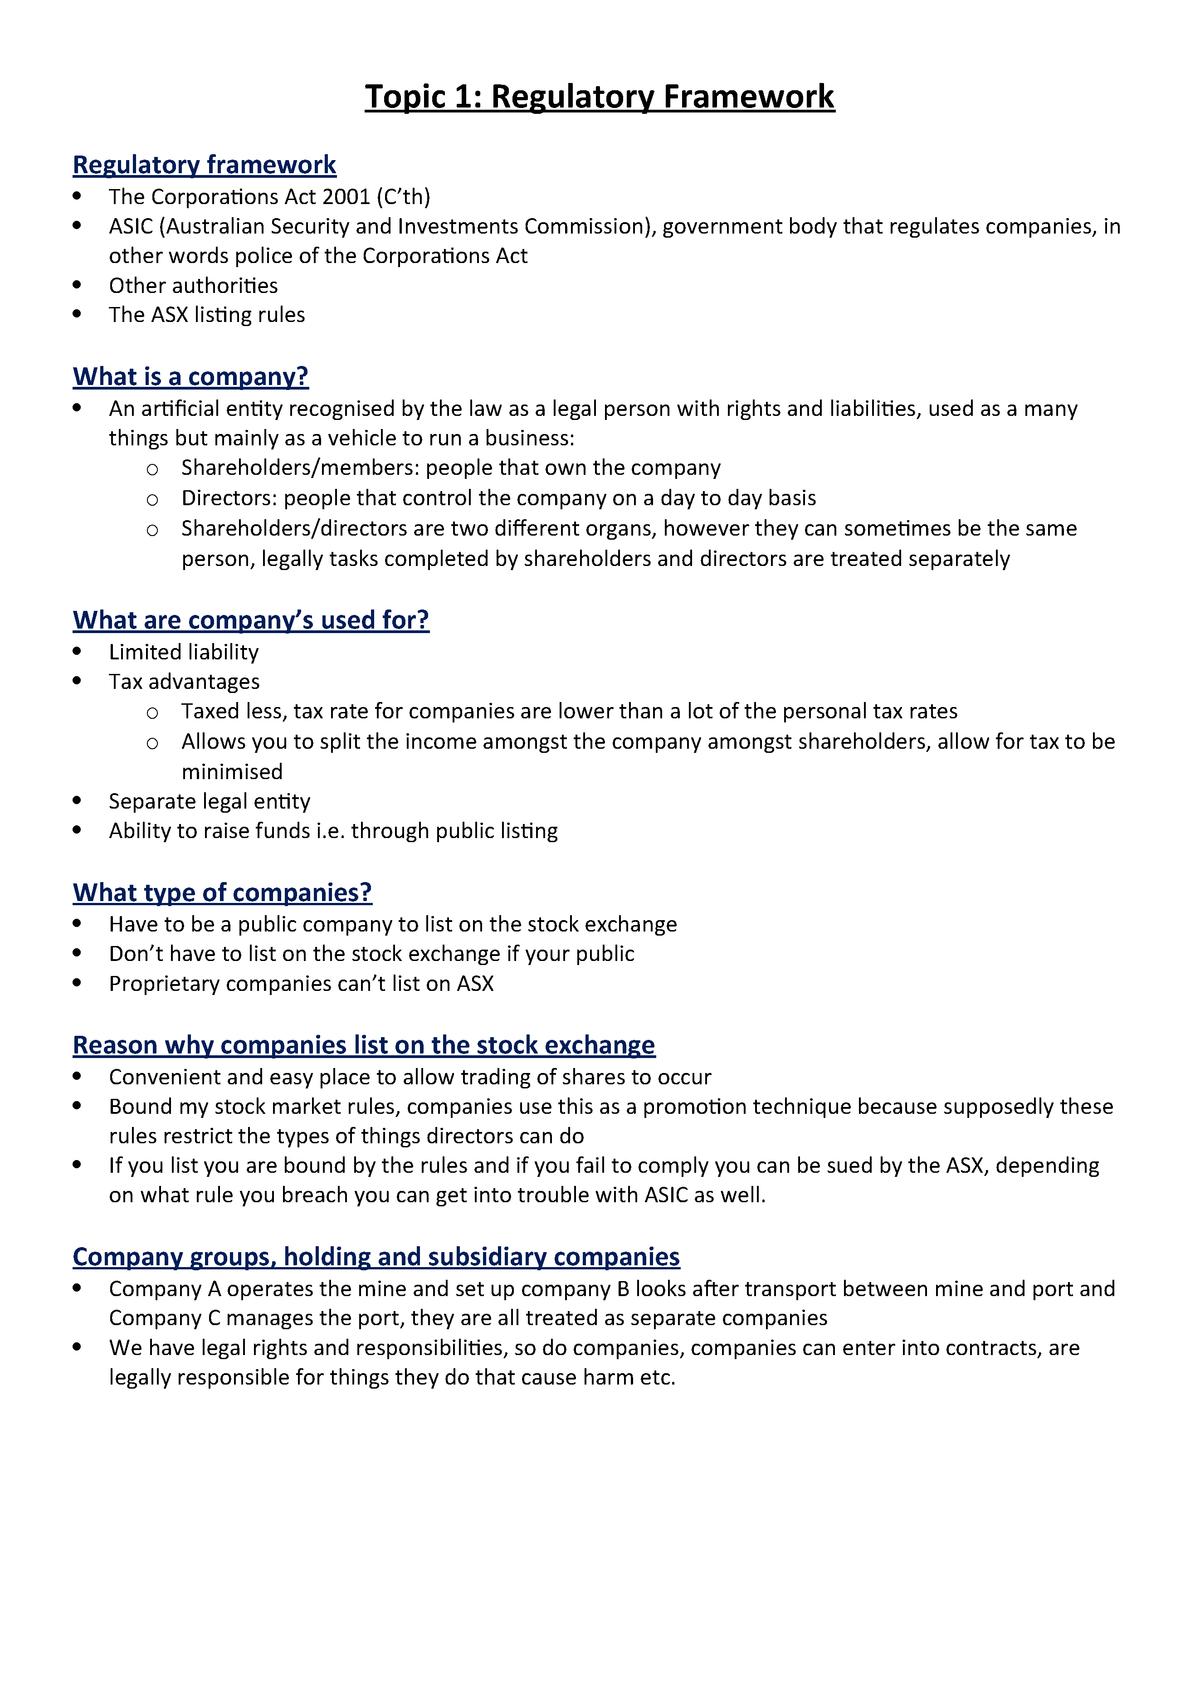 Topic 1 - Regulatory Framework - ACC/ACF3200: Management